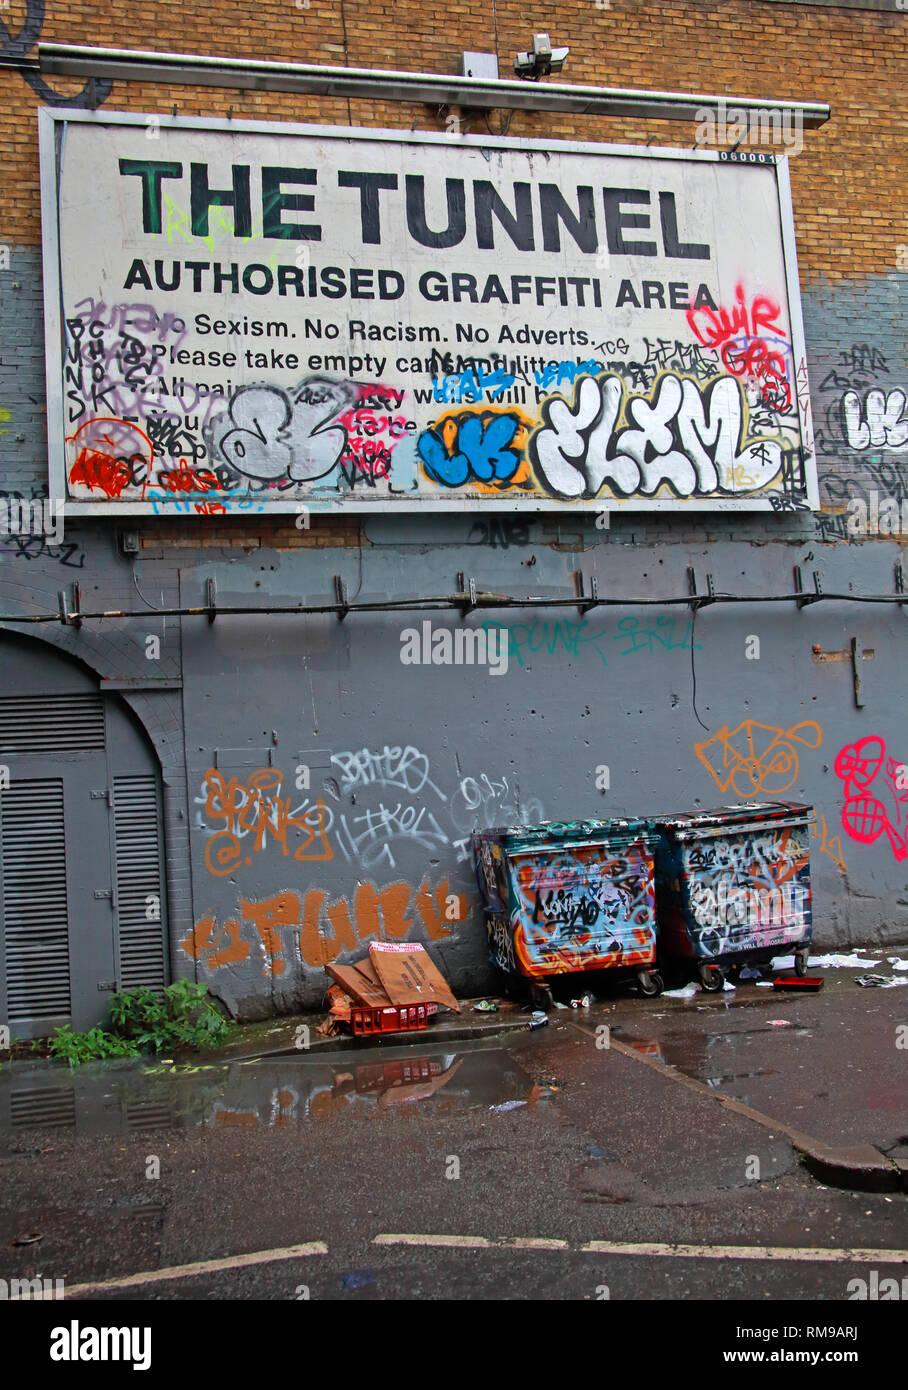 GoTonySmith,HotpixUK,@HotpixUK,England,UK,GB,London,city,centre,South East England,capital,Central London,Lambeth,SE1,Pedestrian tunnel under Waterloo station covered in legal street art,Pedestrian tunnel under Waterloo station,Pedestrian tunnel,under,Waterloo station,SE1 7NN,covered in legal street art & graffiti,decorated,covered,in,legal street art,legal graffiti,paint,painted,legal,street art,graffiti,No Sexism,No Racism,No,Adverts,spray paint,Leake Street Arches,arches,tunnel